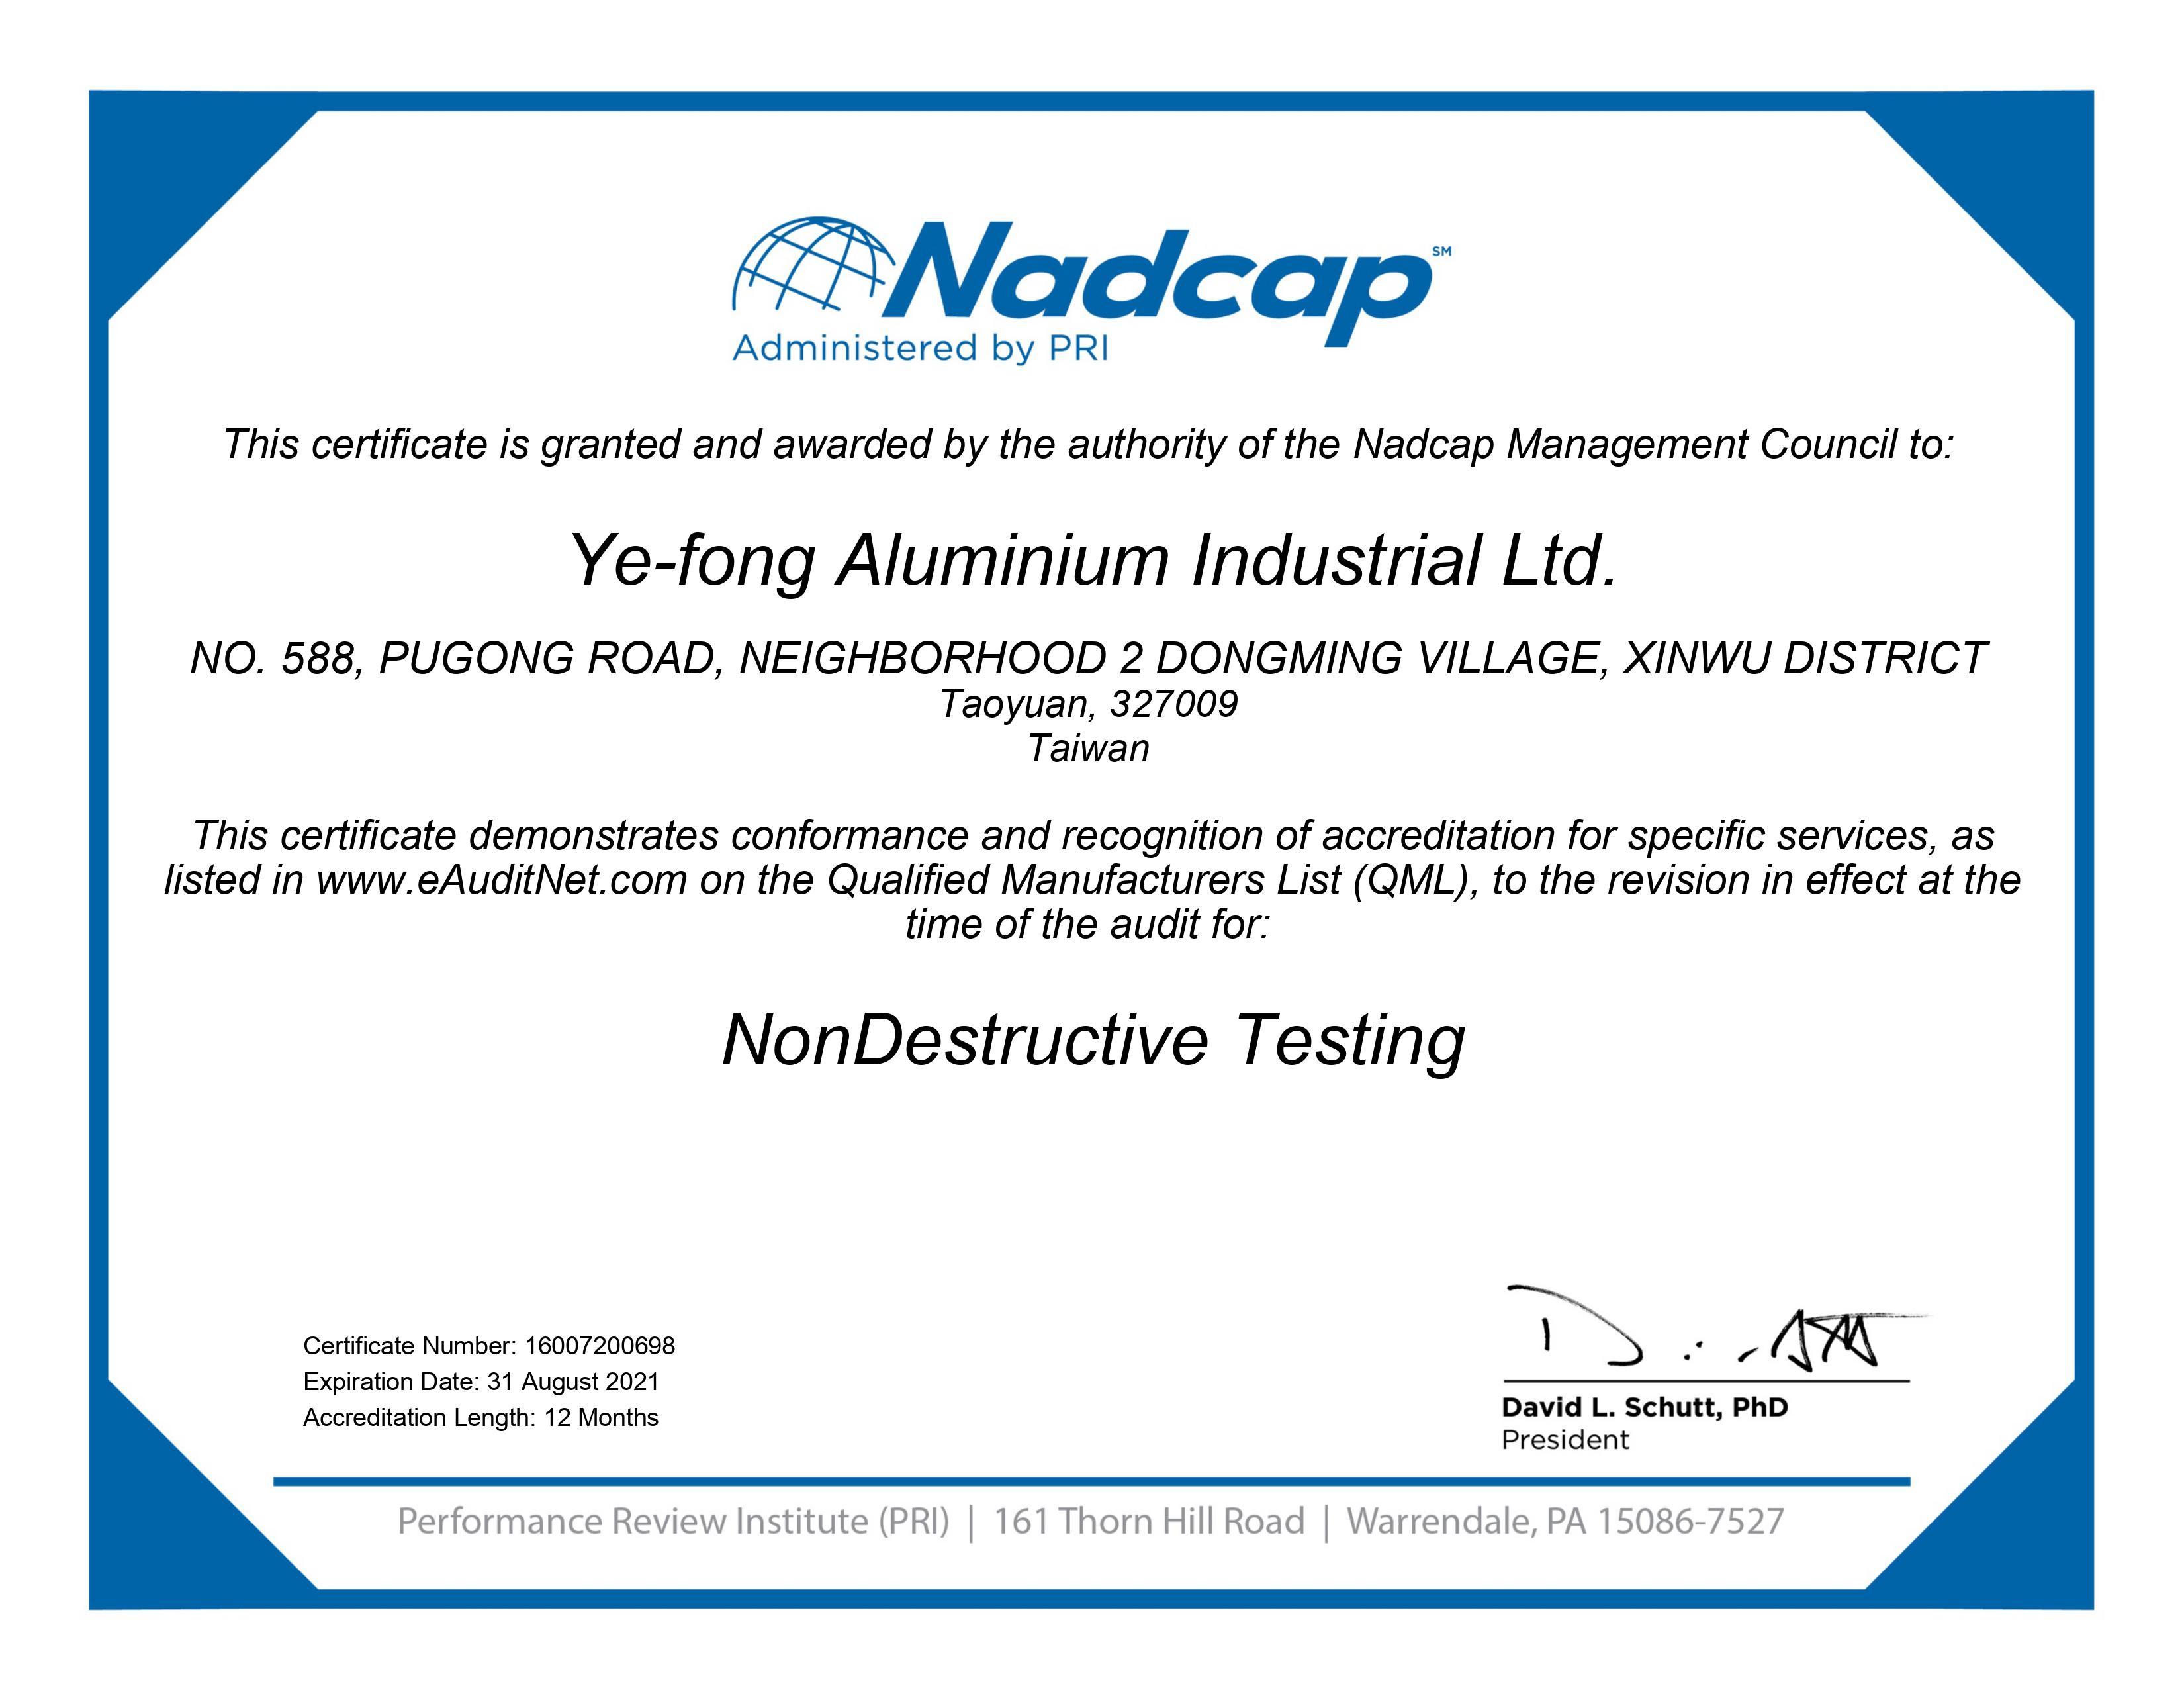 NADCAP-NDT certificates